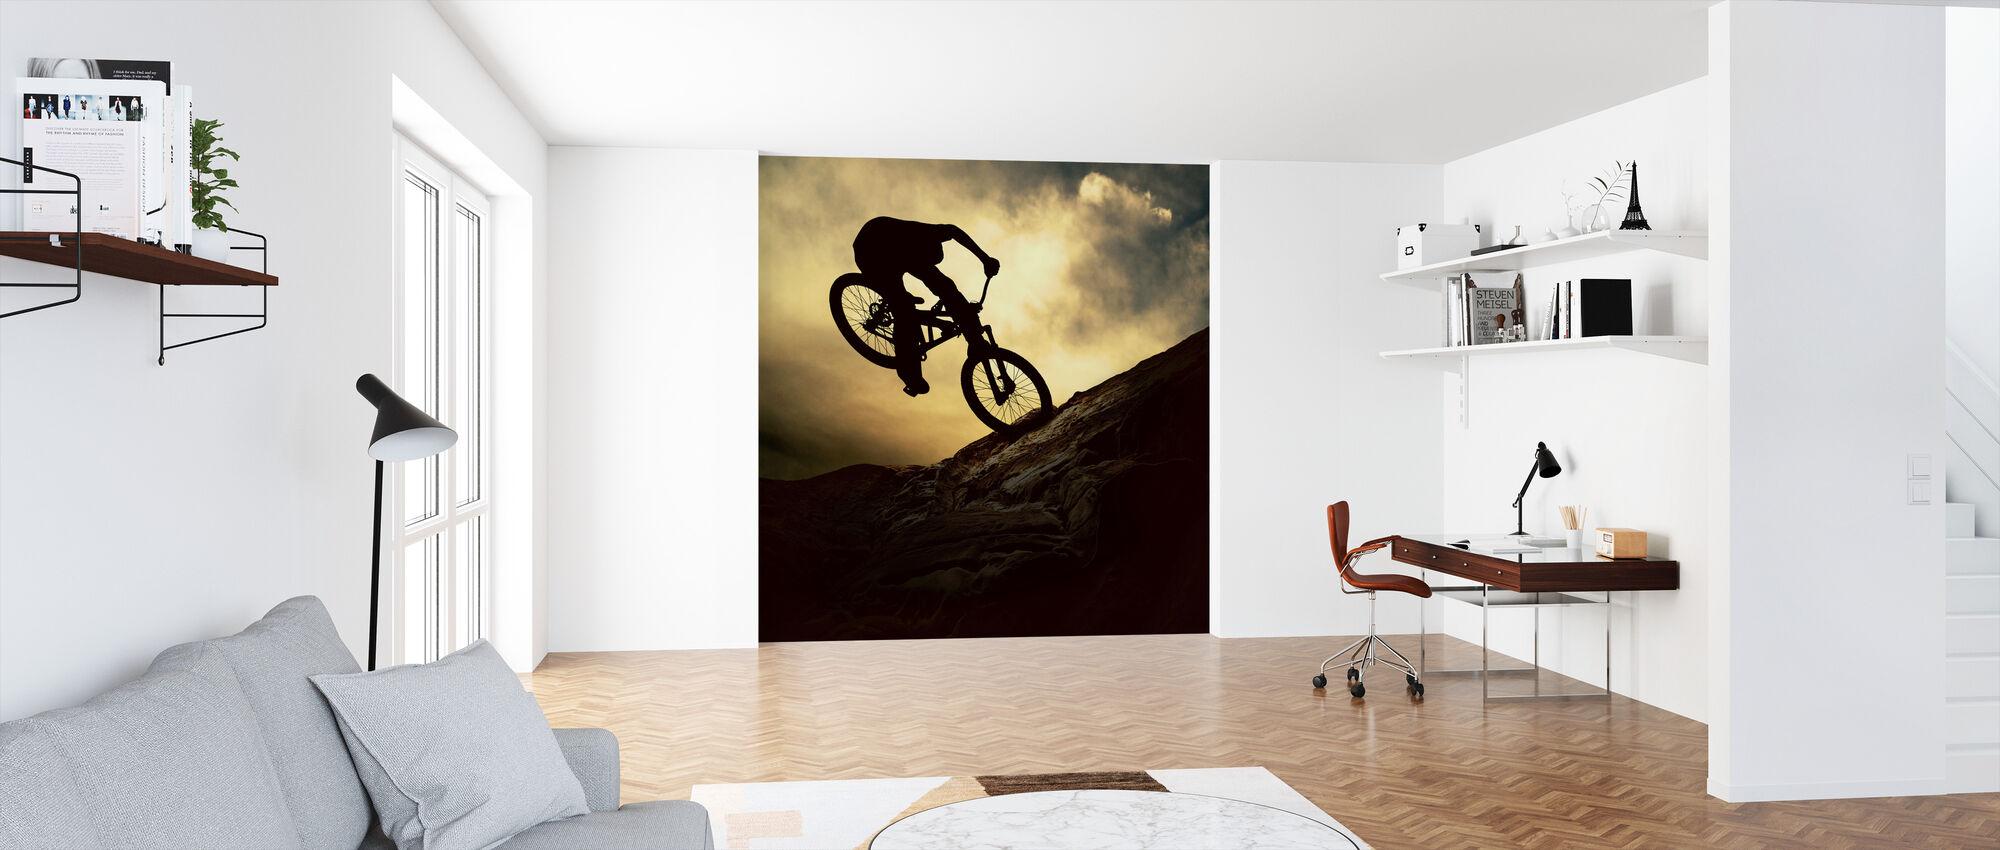 Mountain Bike Rider - Wallpaper - Office